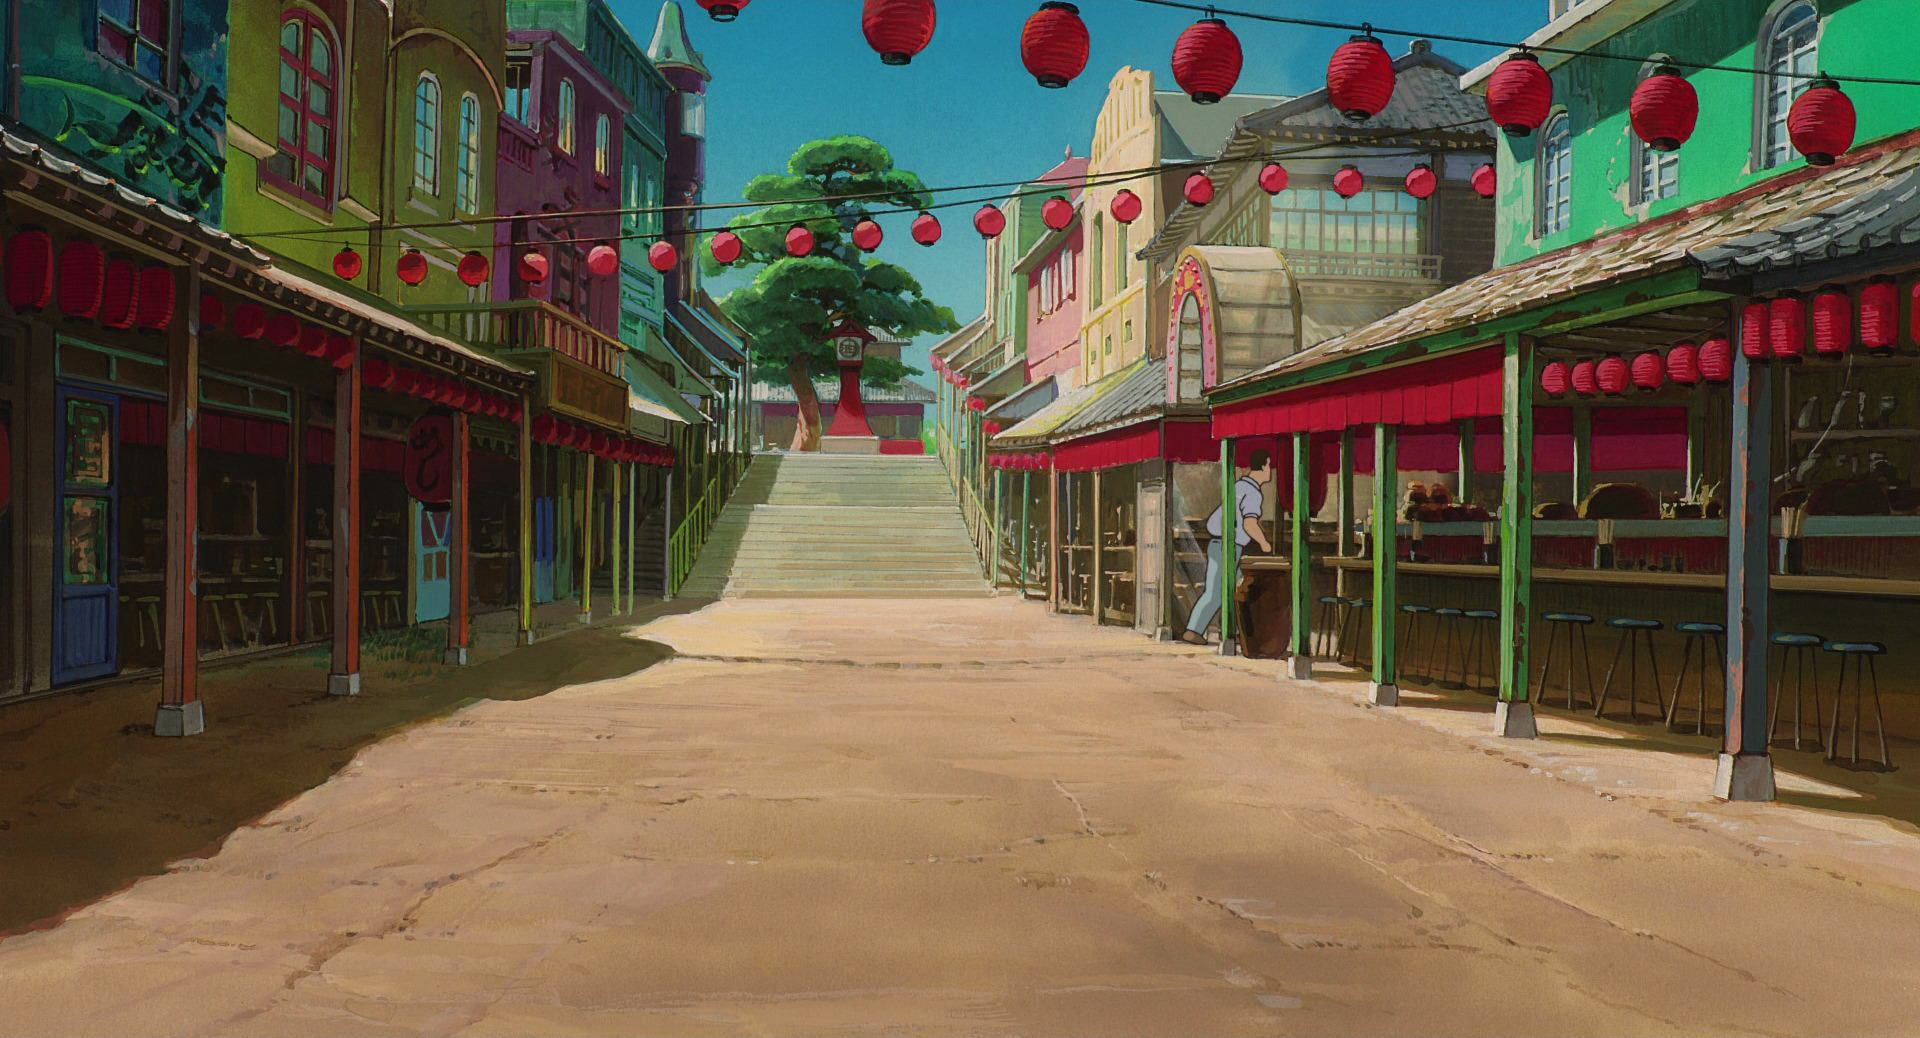 Spirited Away (2001) 1080p Animation Screencaps